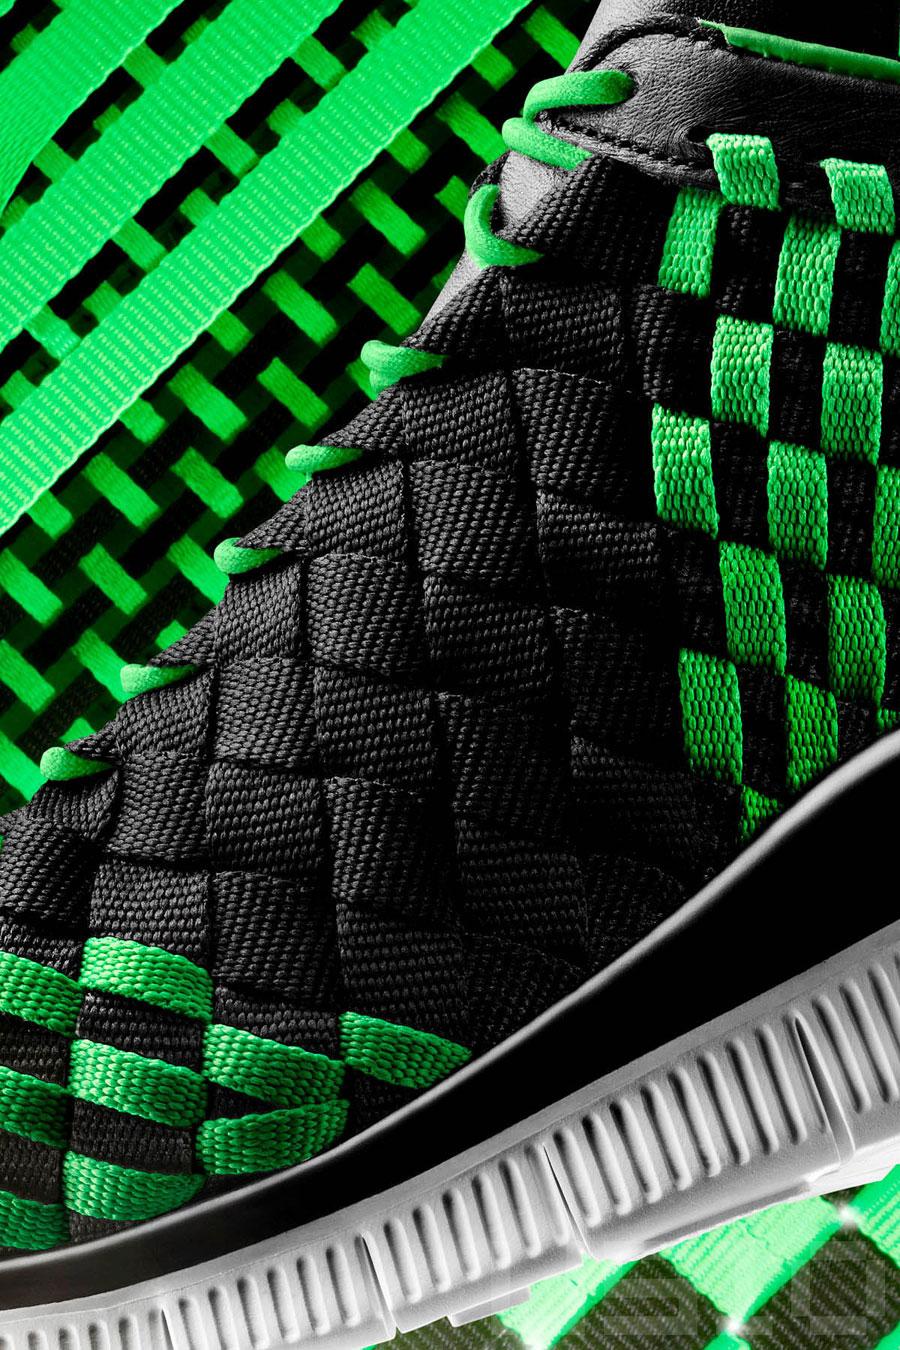 on sale b3f2d 04ea8 Nike Free Inneva Woven - Black - Poison Green - Sail - SneakerNews.com